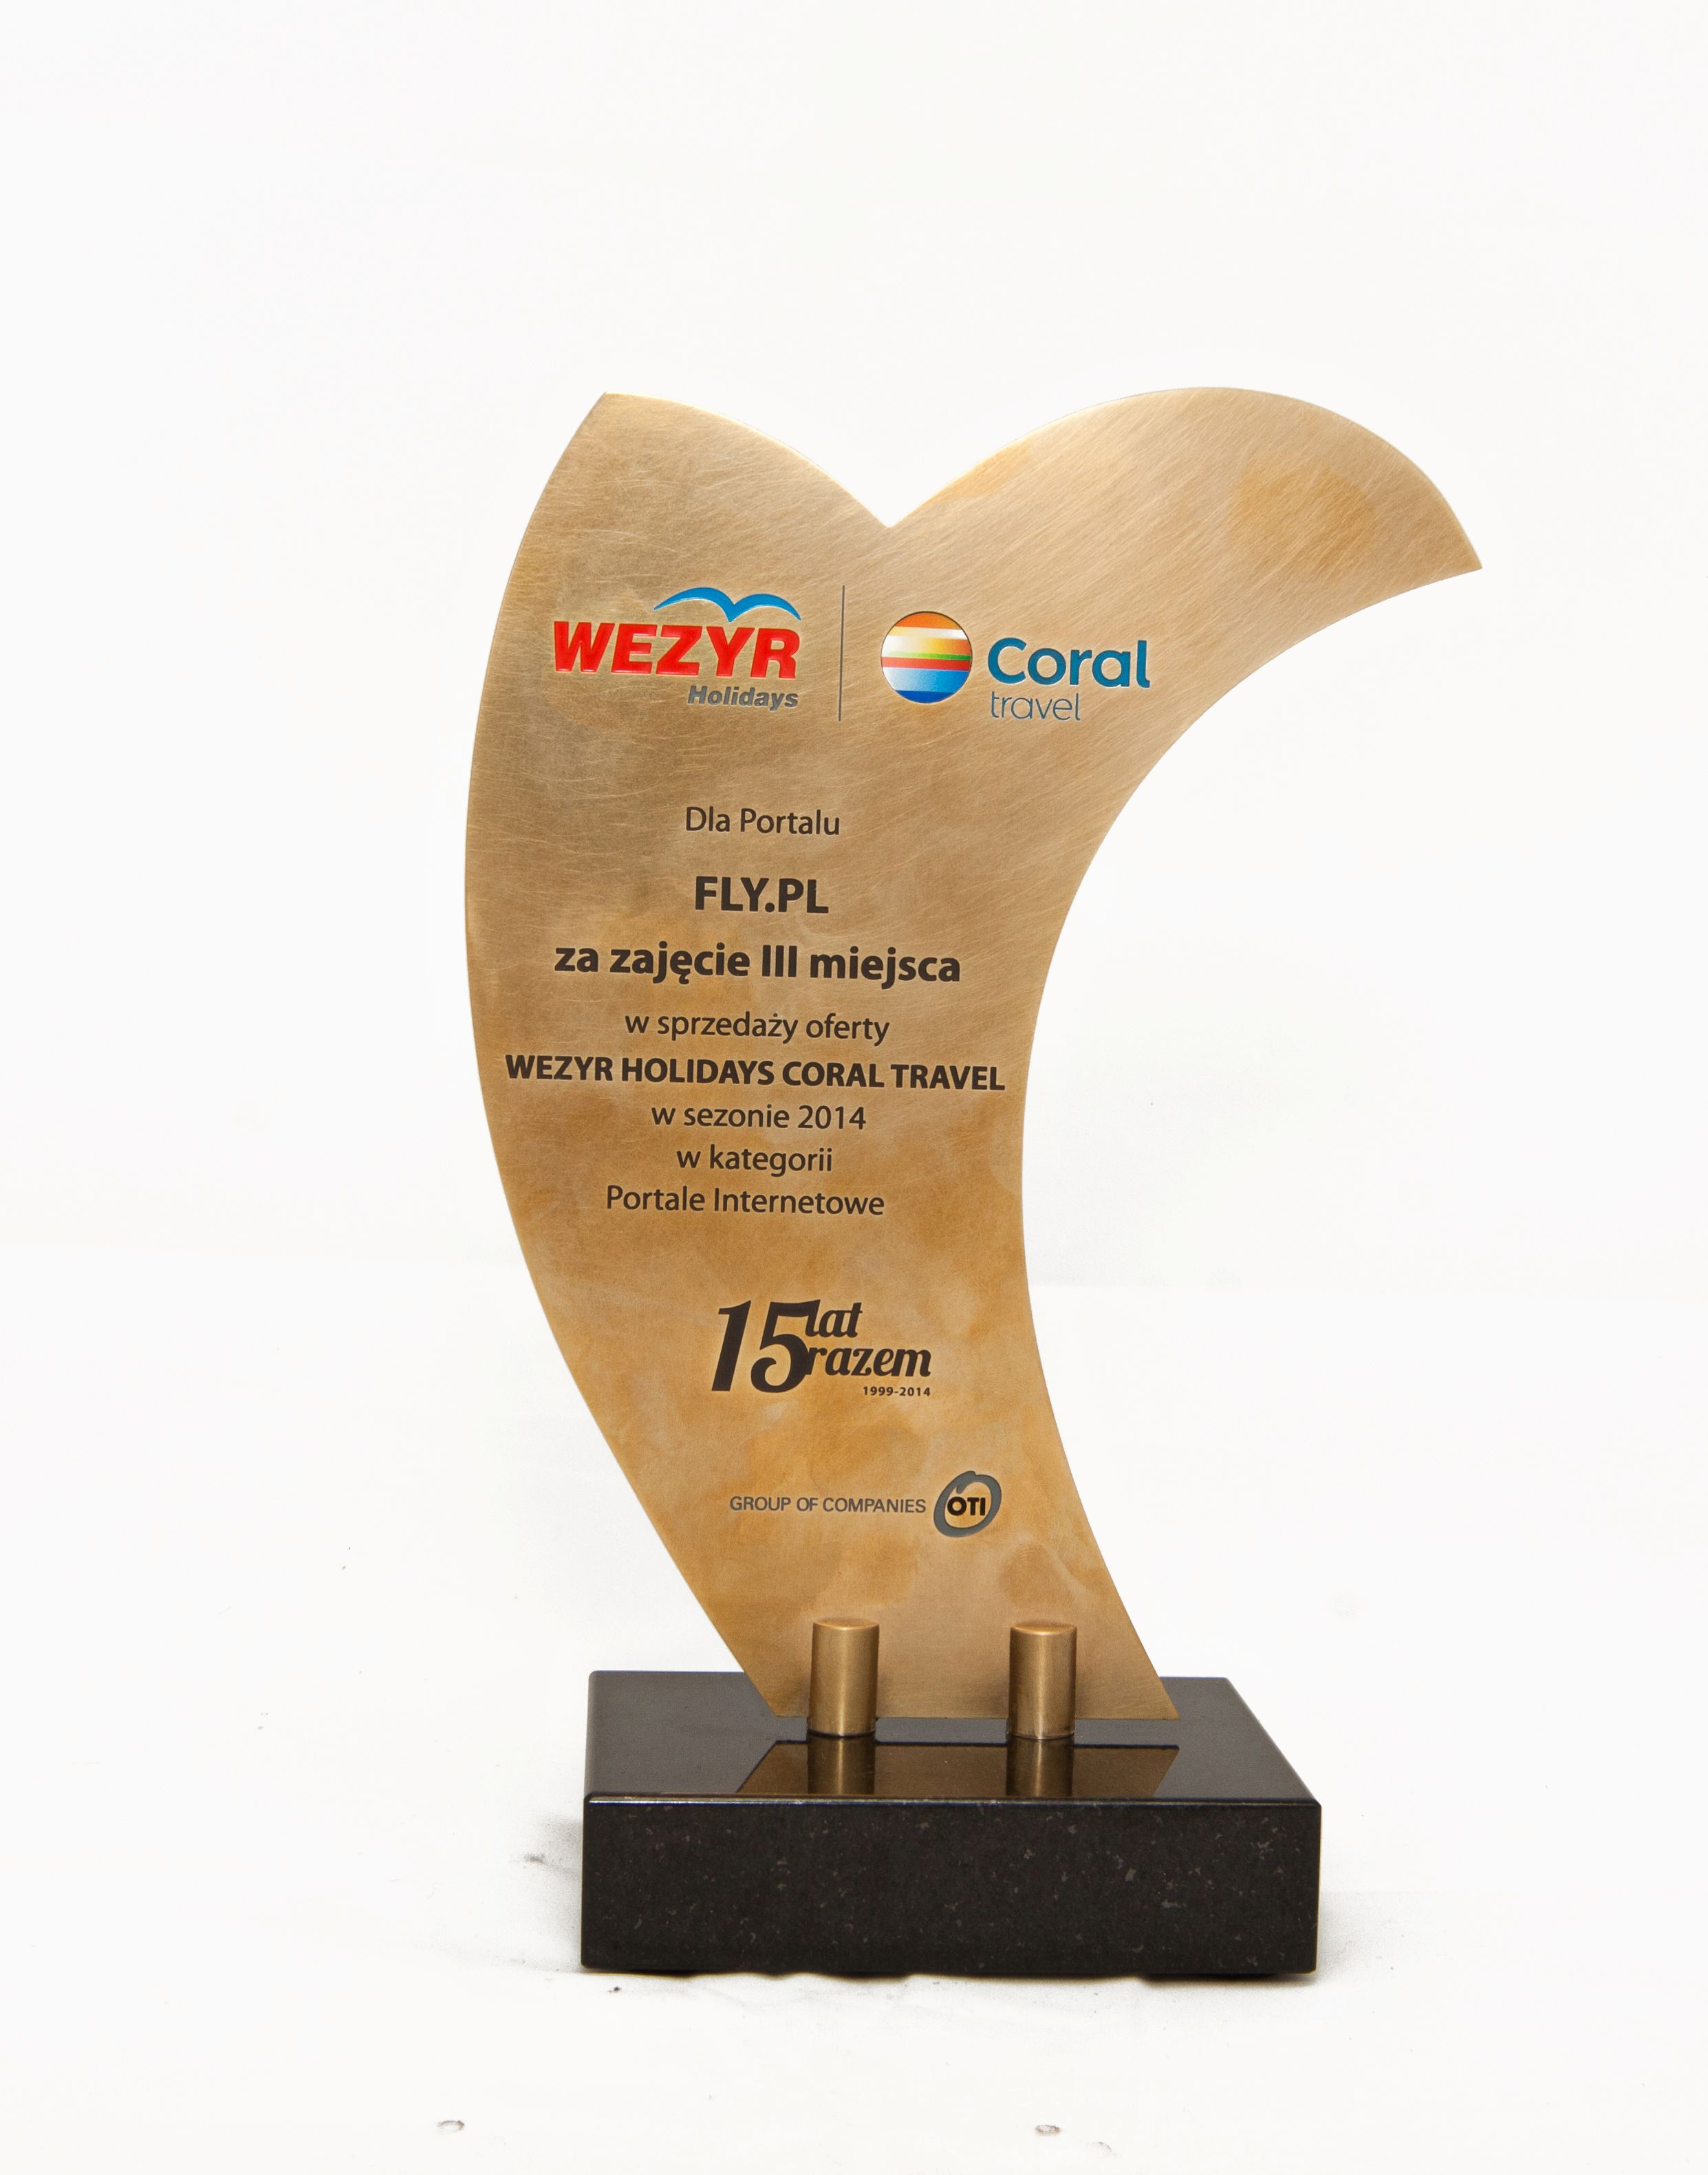 Nagroda Wezyr Holidays Coral Travel dla FLY.PL